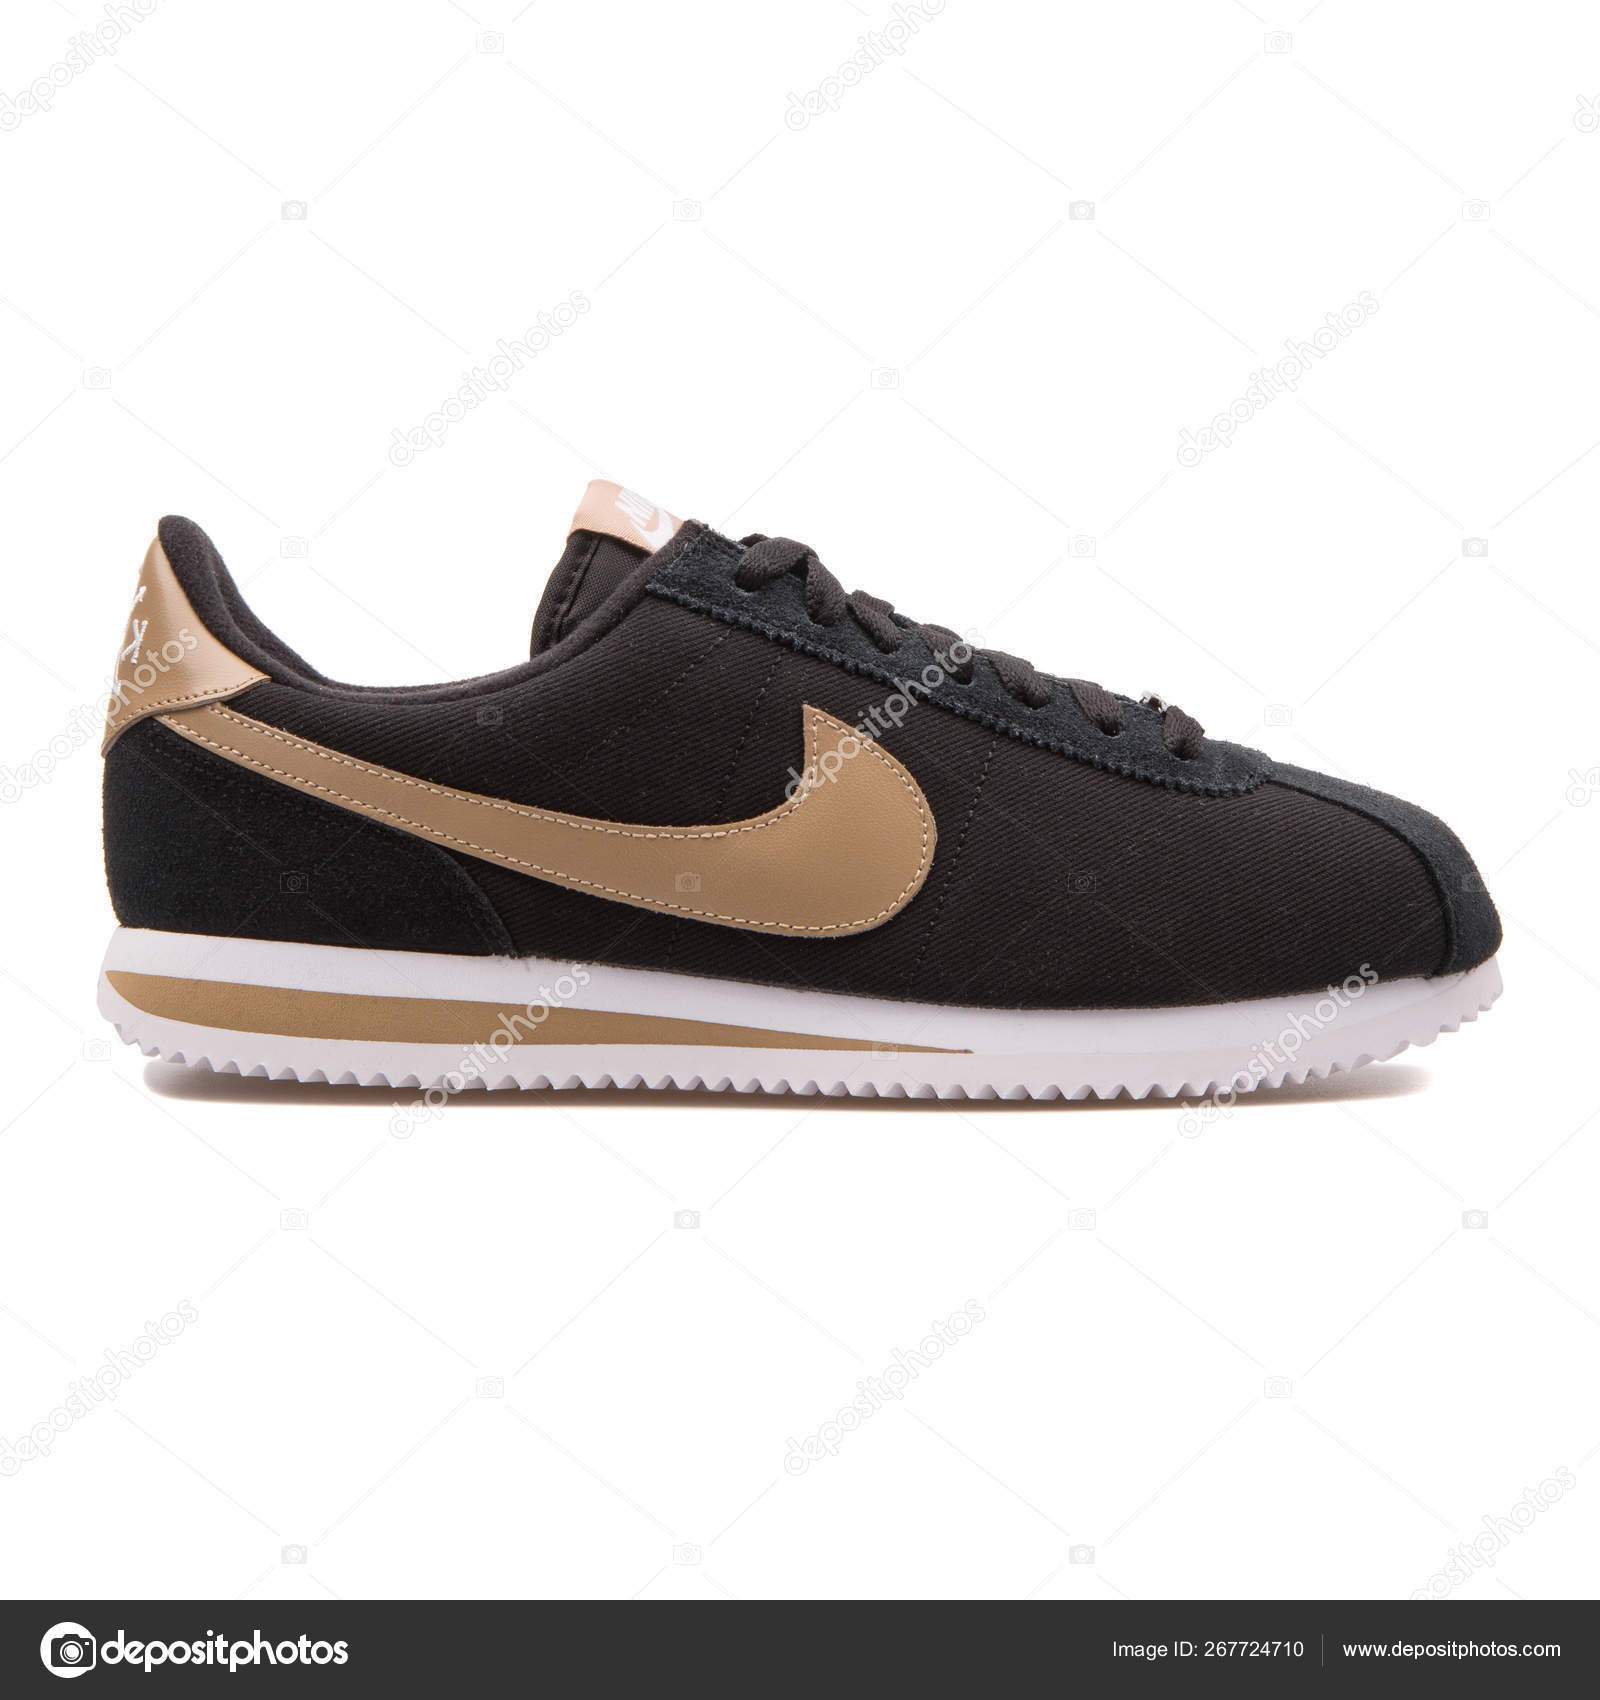 80bc77e6 Nike Cortez Basic Premium QS black and beige sneaker — Stock Photo